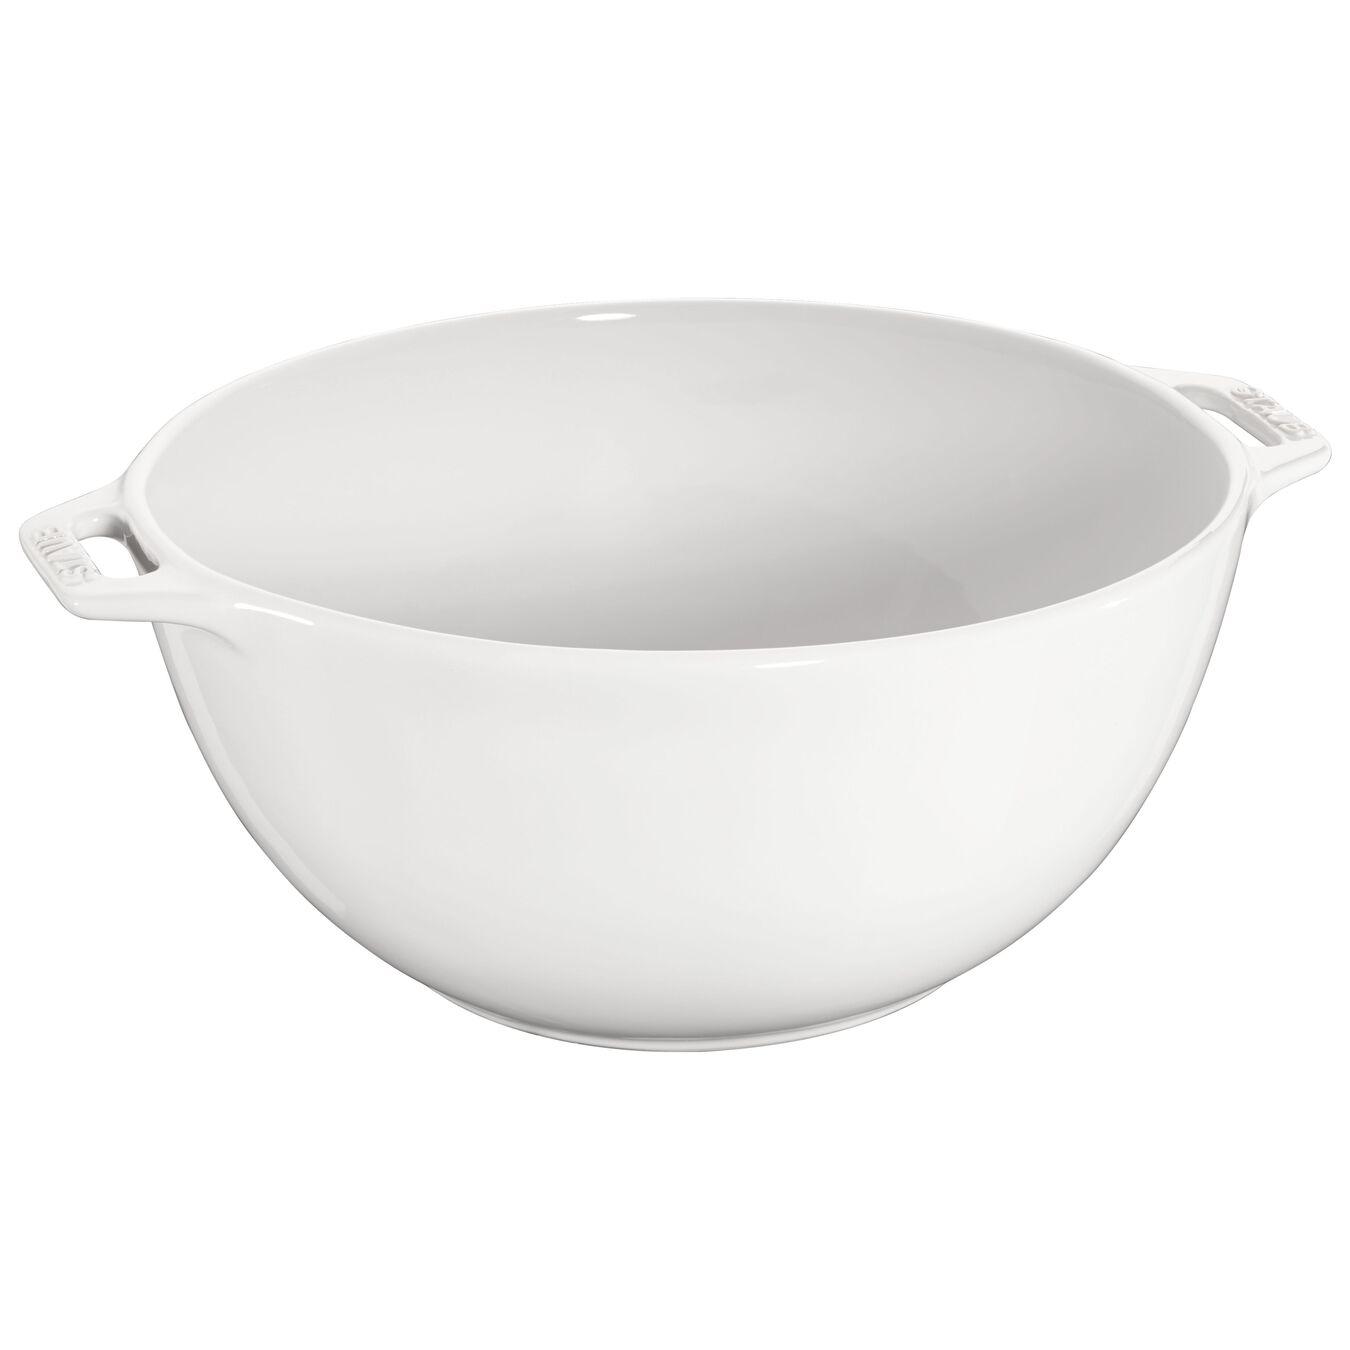 Bowl 24 cm, Cerâmica, Branco puro,,large 1